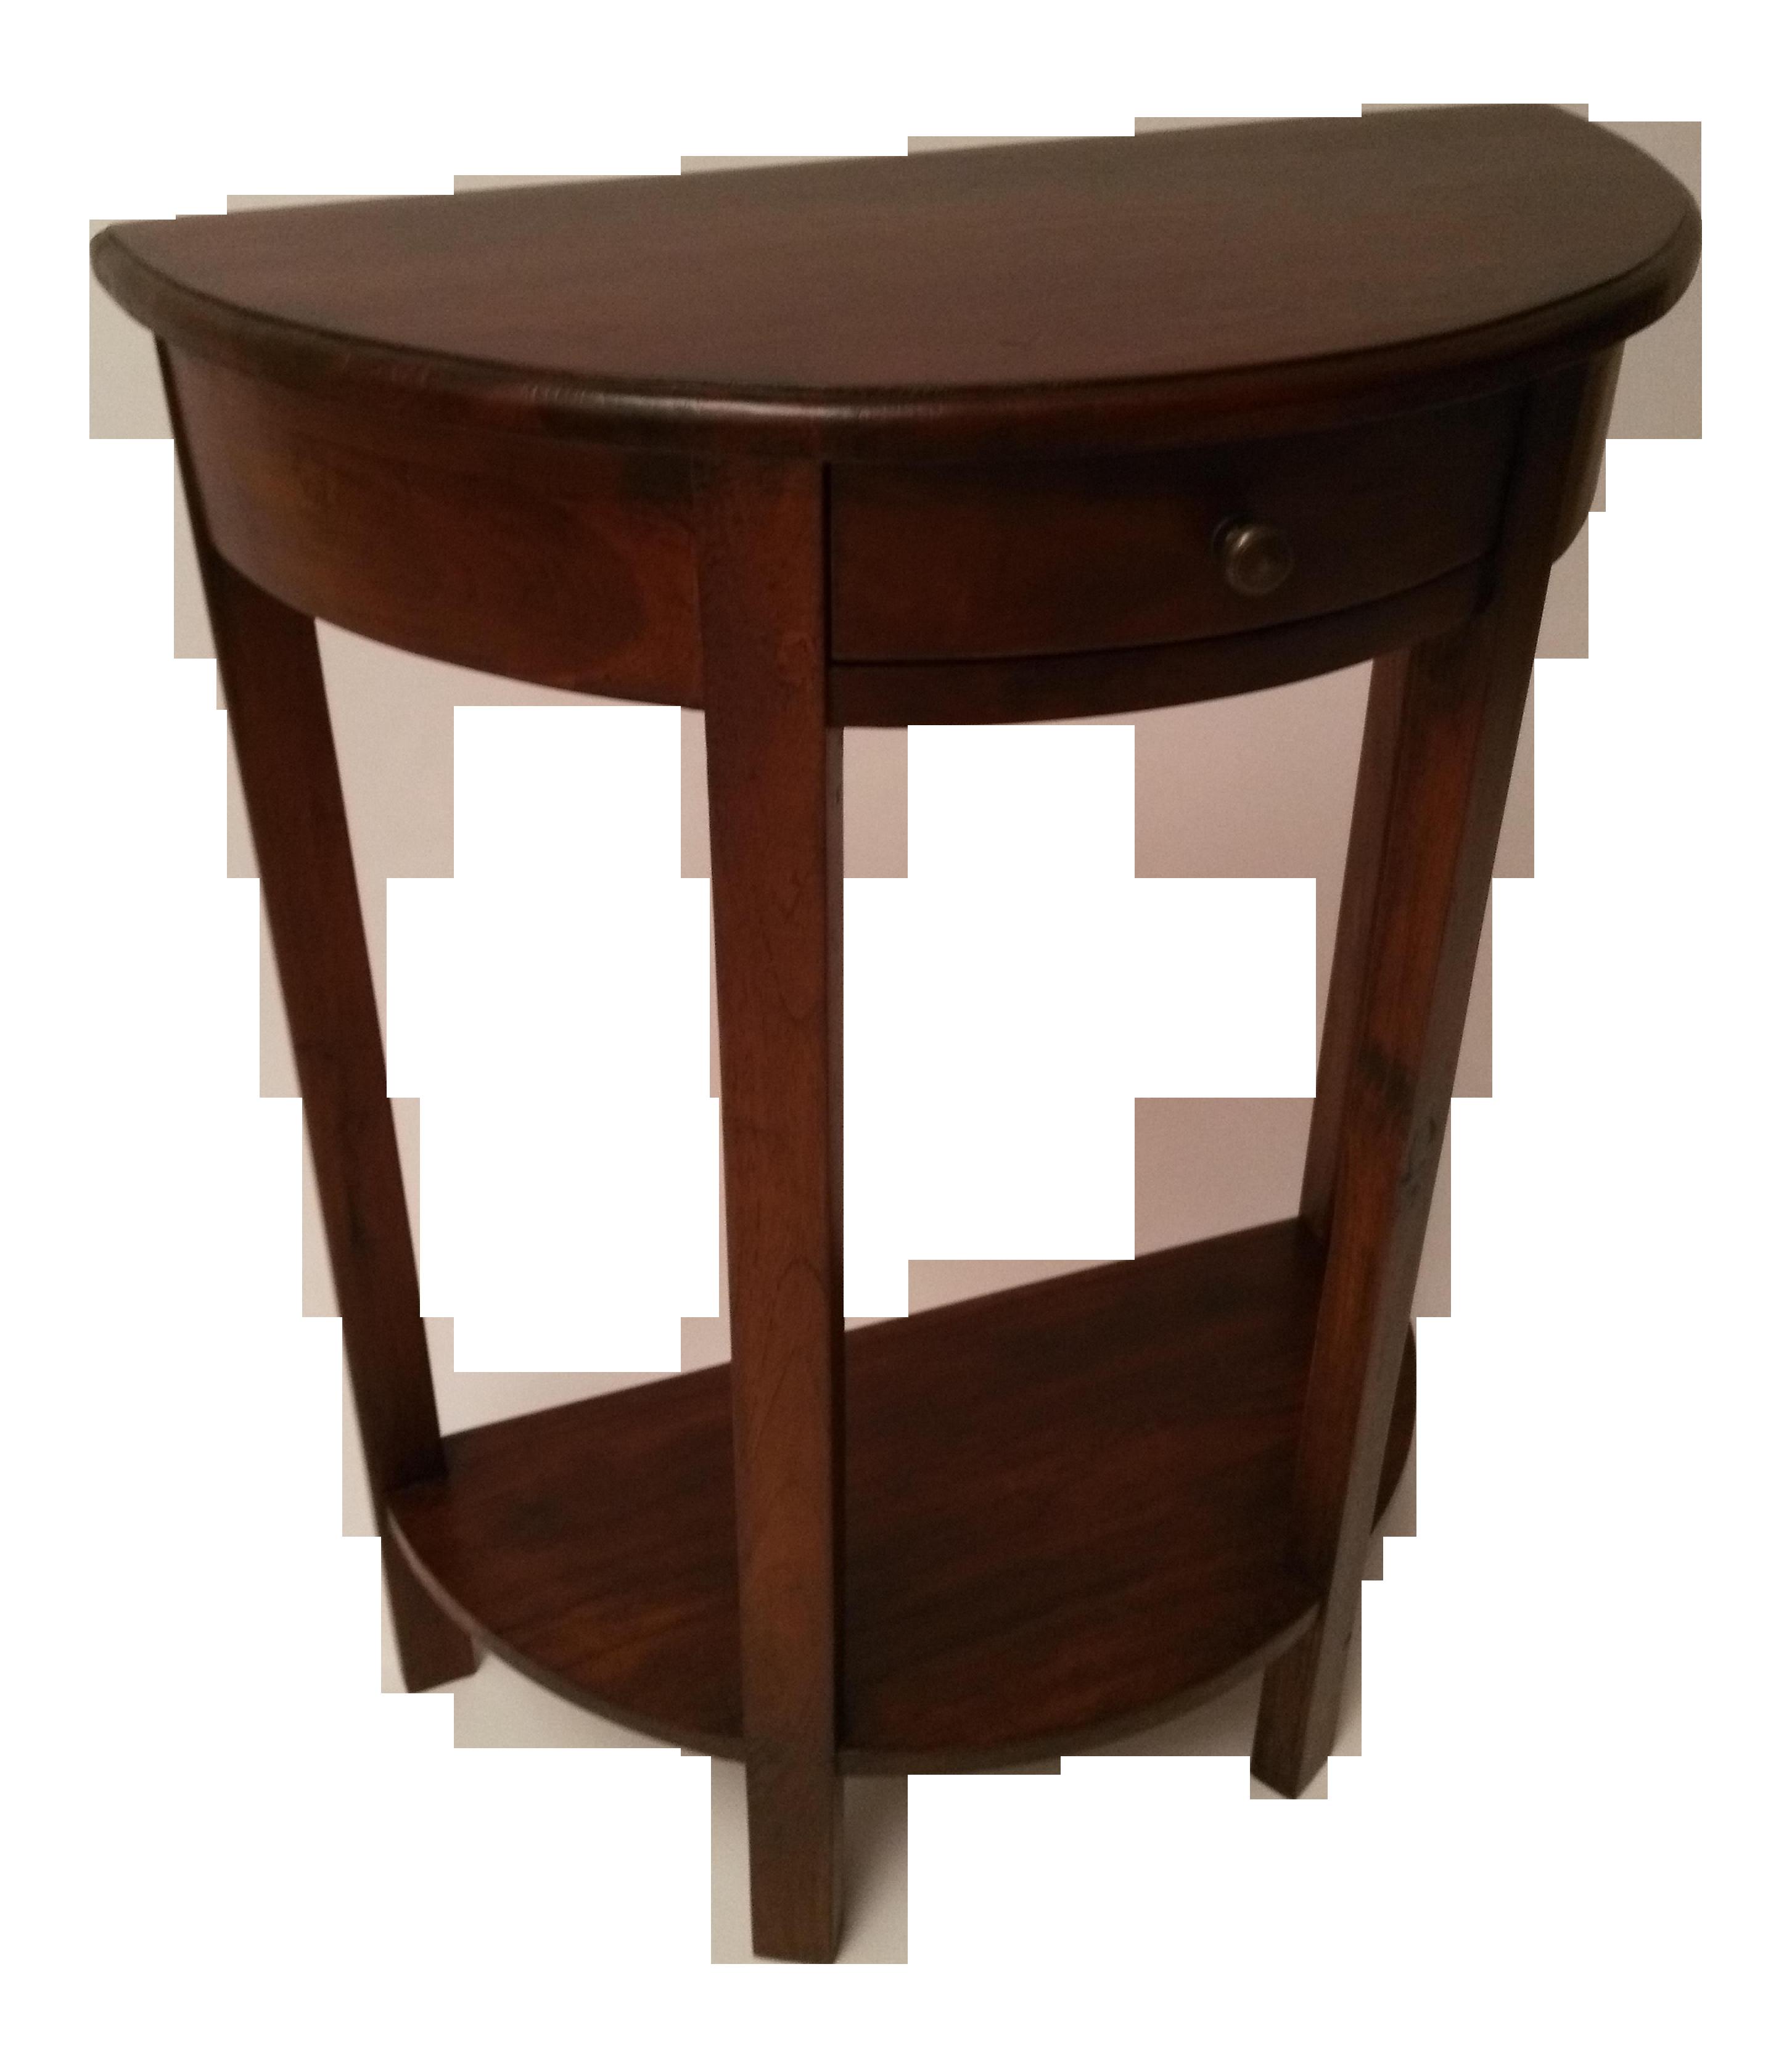 Demi lune side table chairish - Table demi lune murale ...